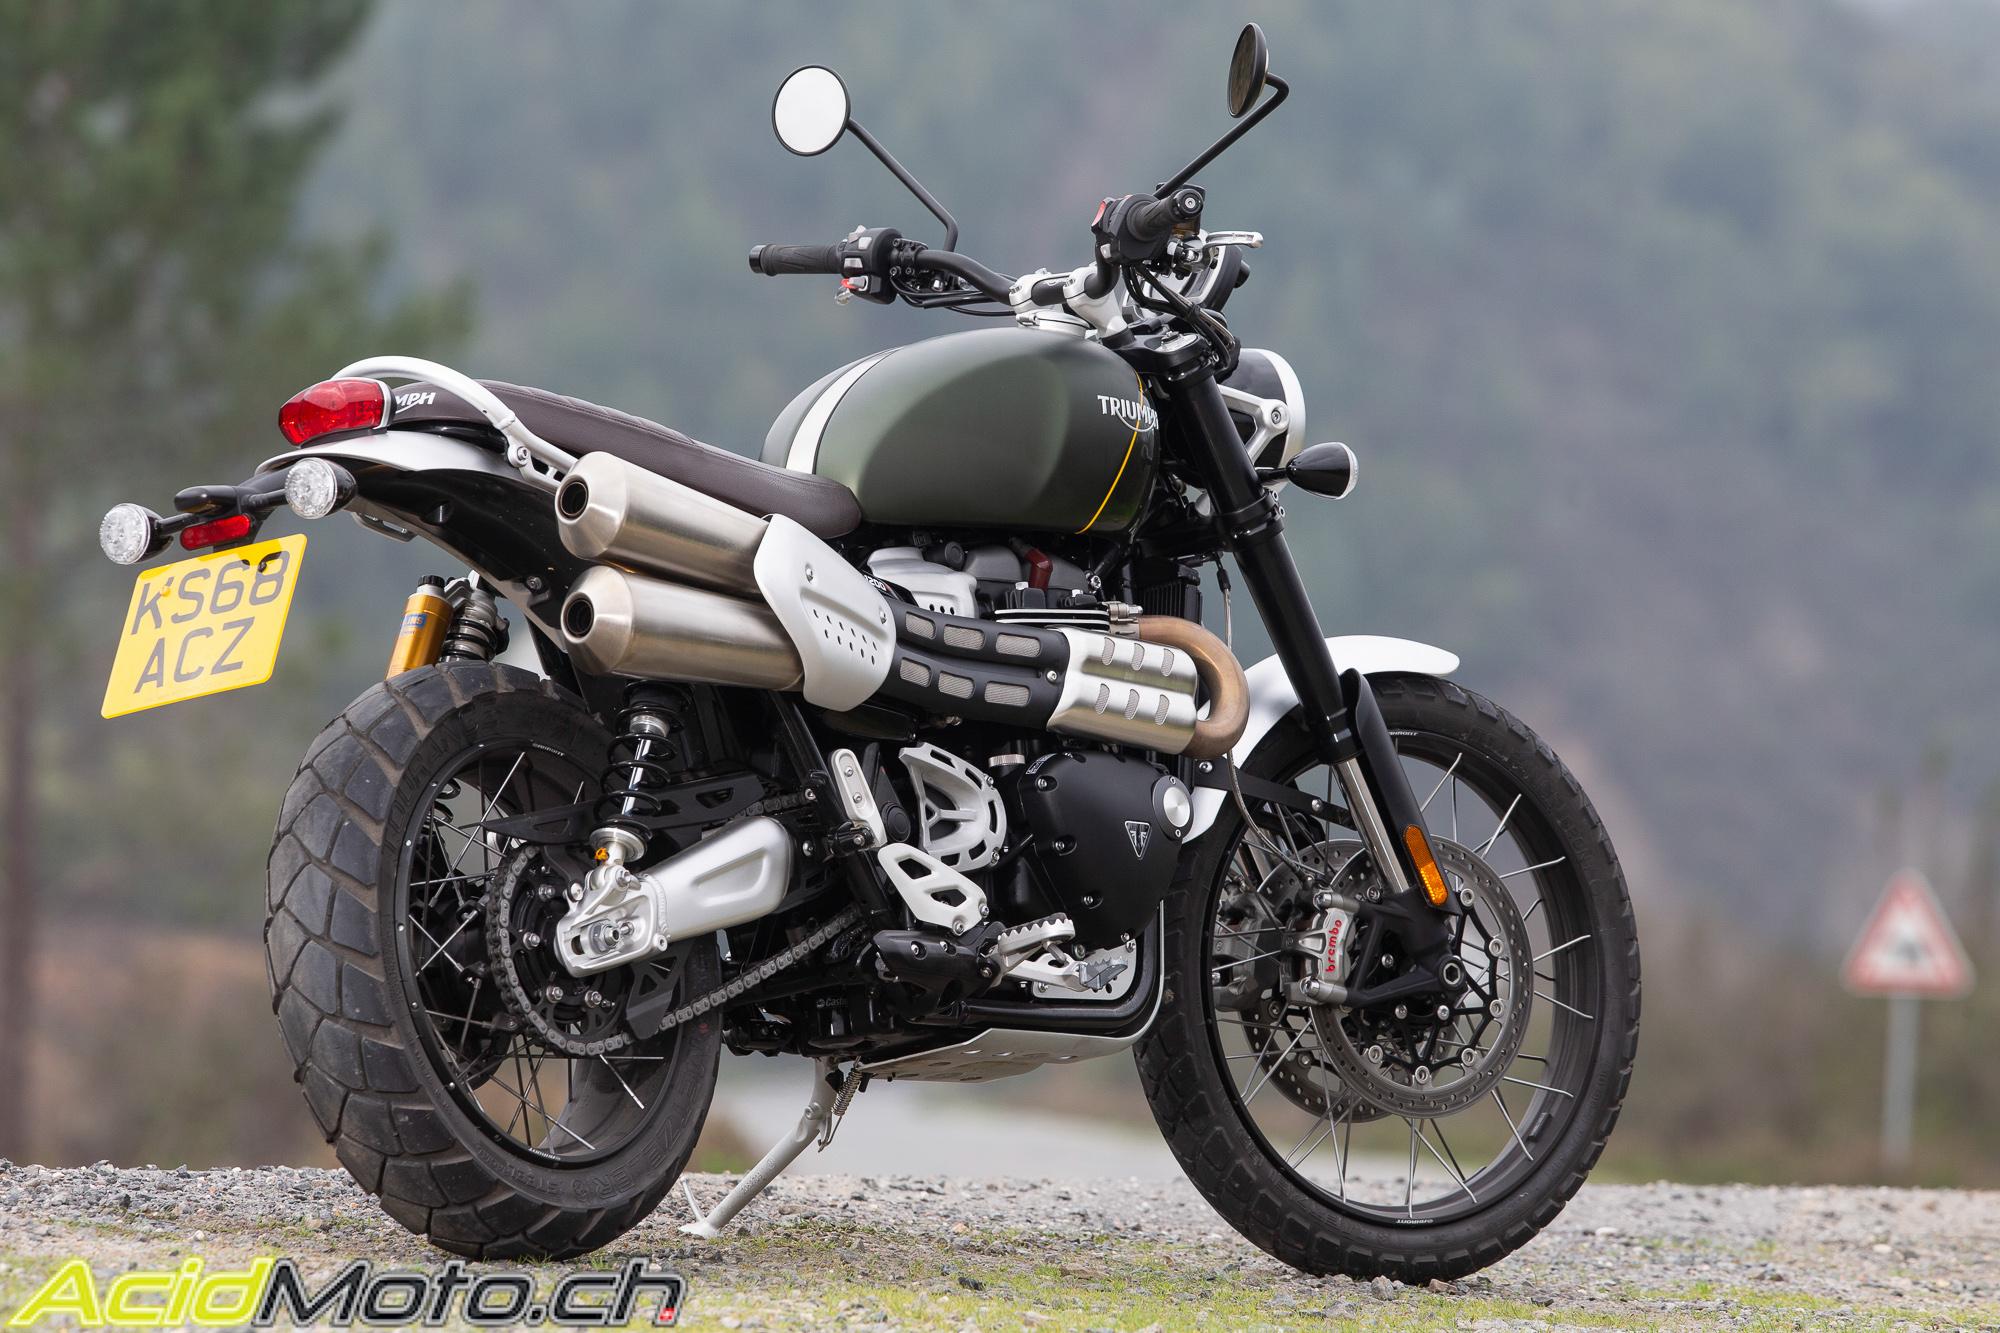 Neumotorrad: Triumph Scrambler 1200 XC, Baujahr: 2020, 14